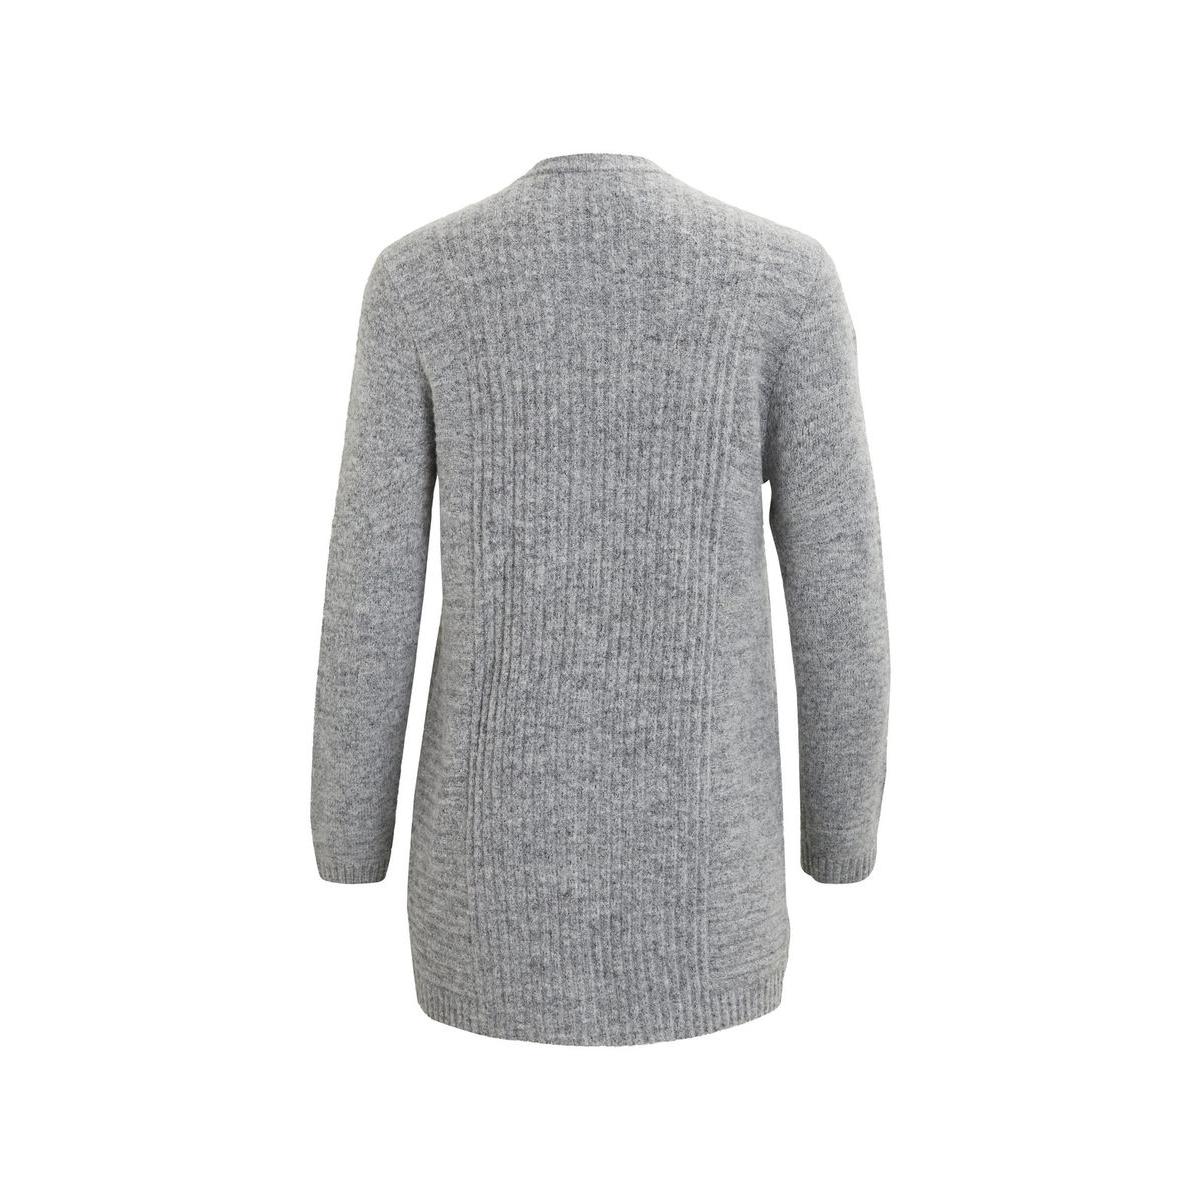 objnonsia rib l/s knit cardigan noo 23024915 object vest light grey melange